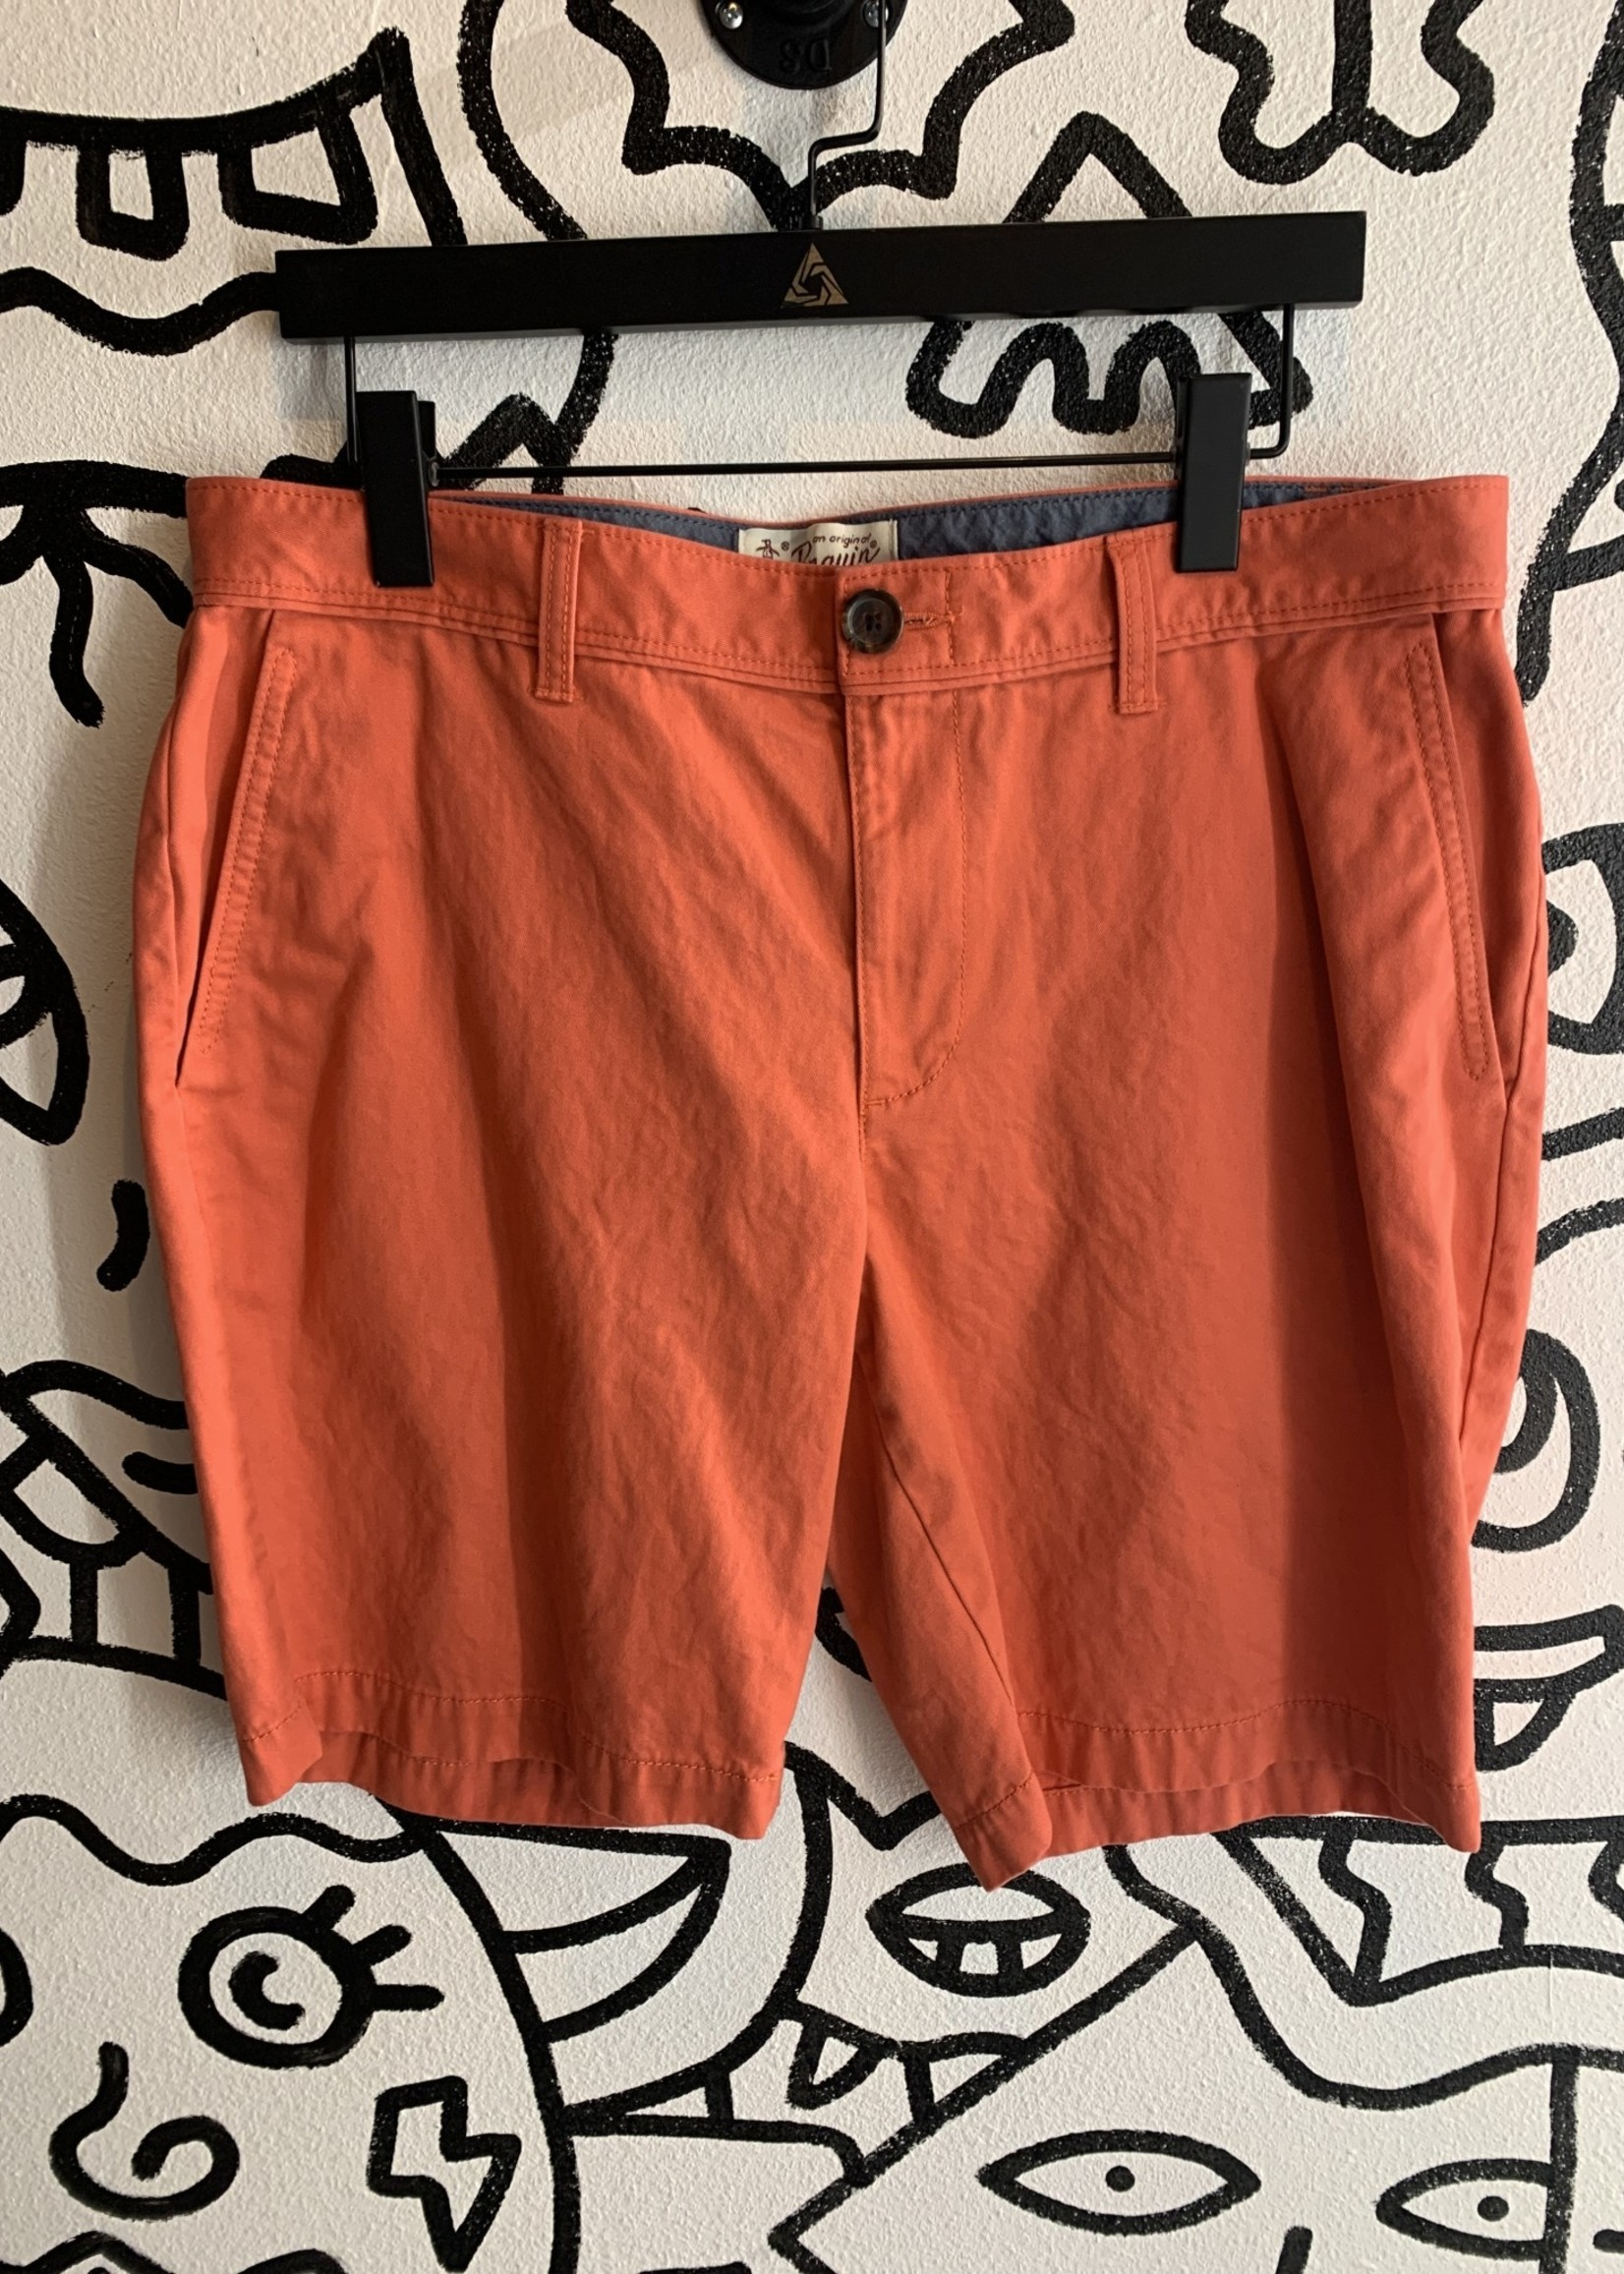 Penguin orange/red short 34